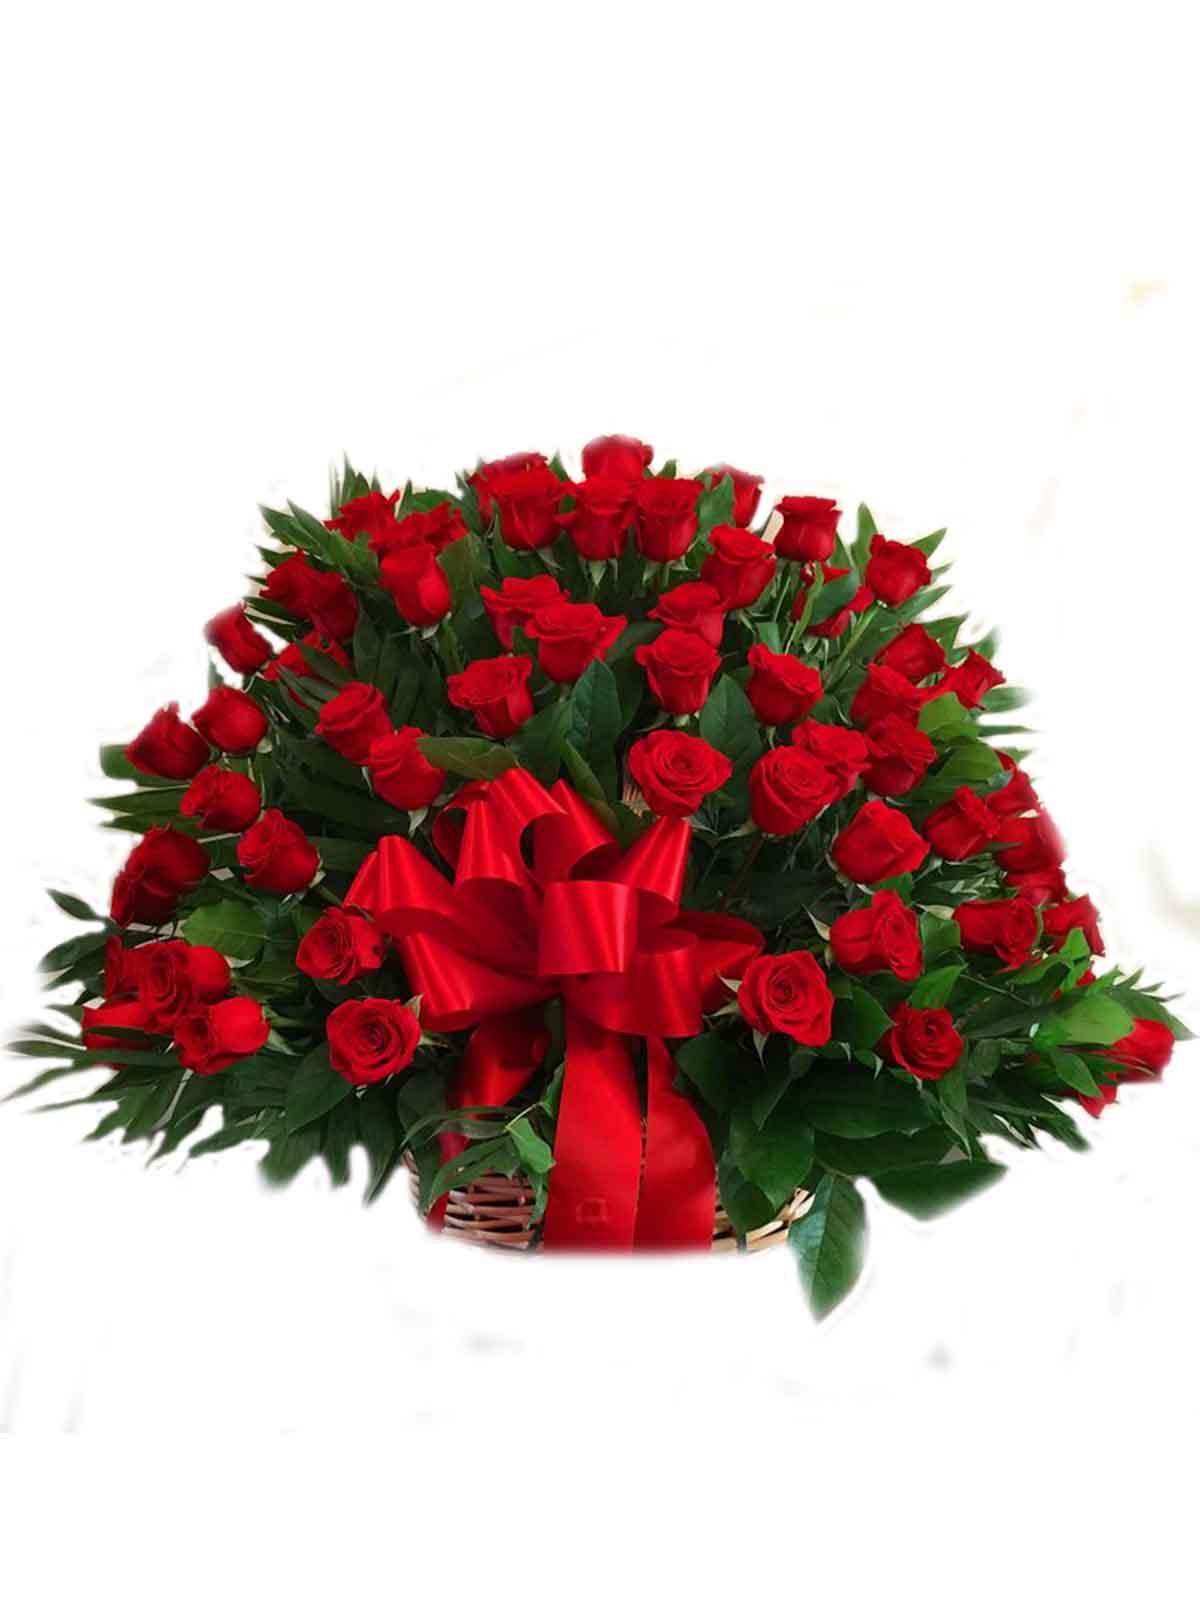 1124 Funeral Basket 004